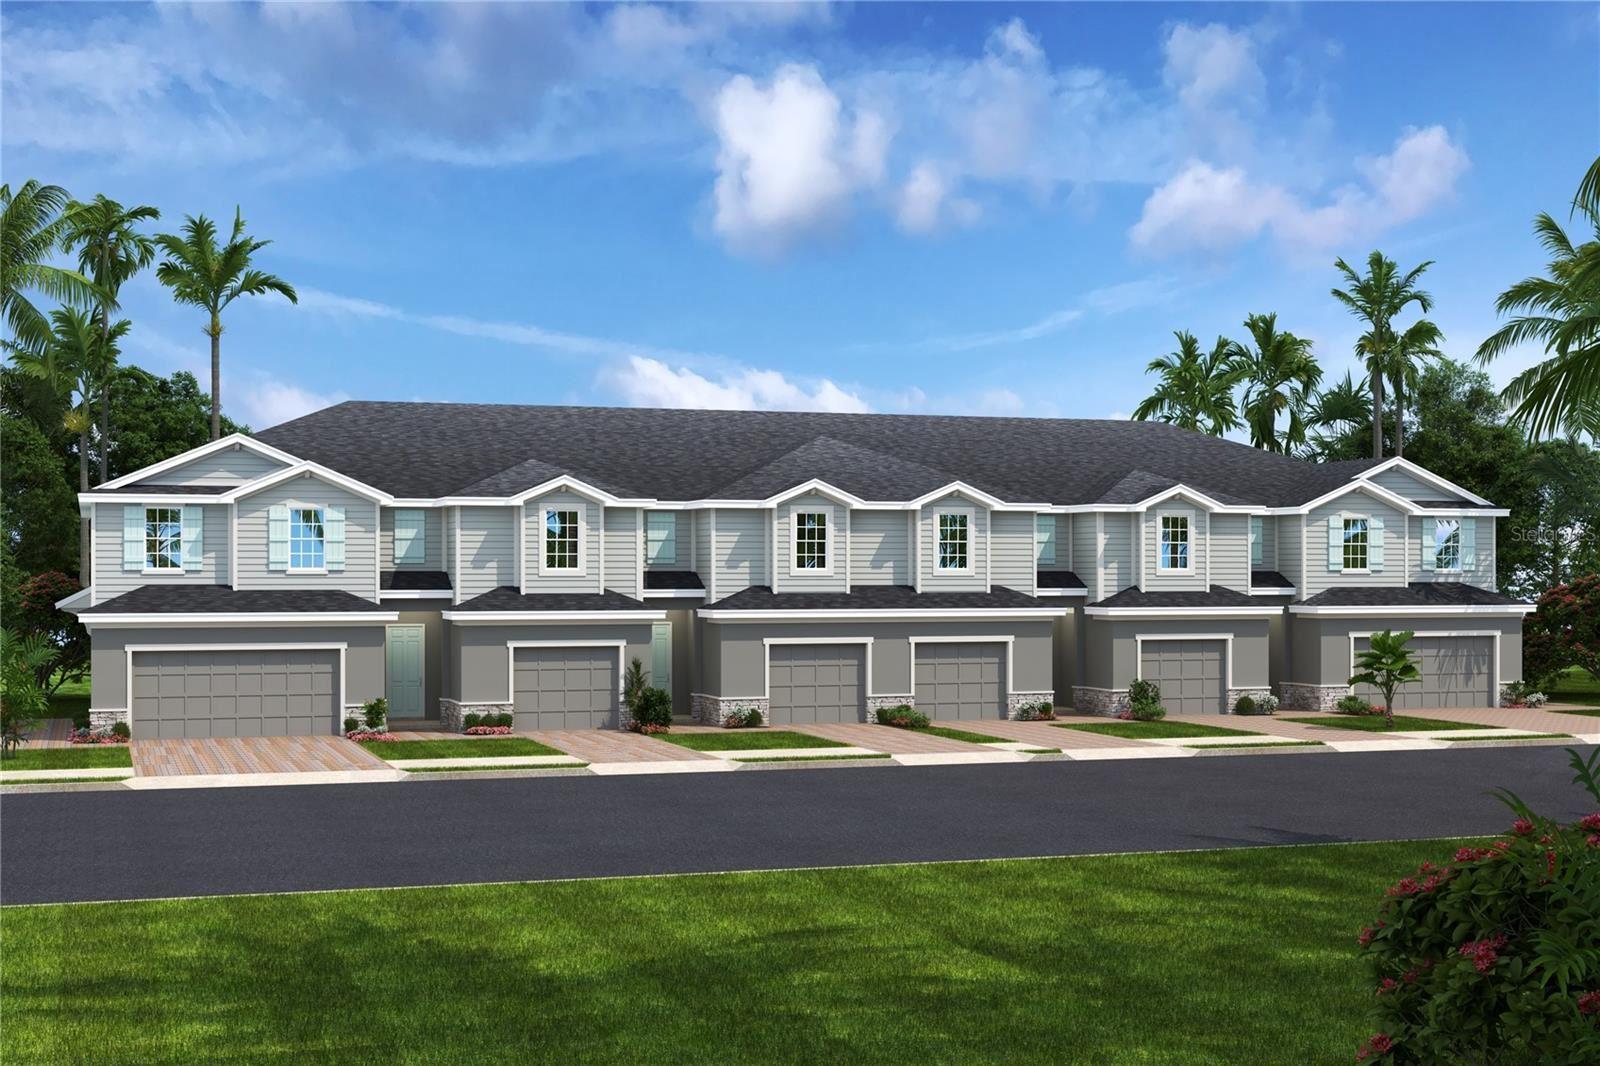 1907 HOLDEN RIDGE LANE, Minneola, FL 34715 - #: W7835108